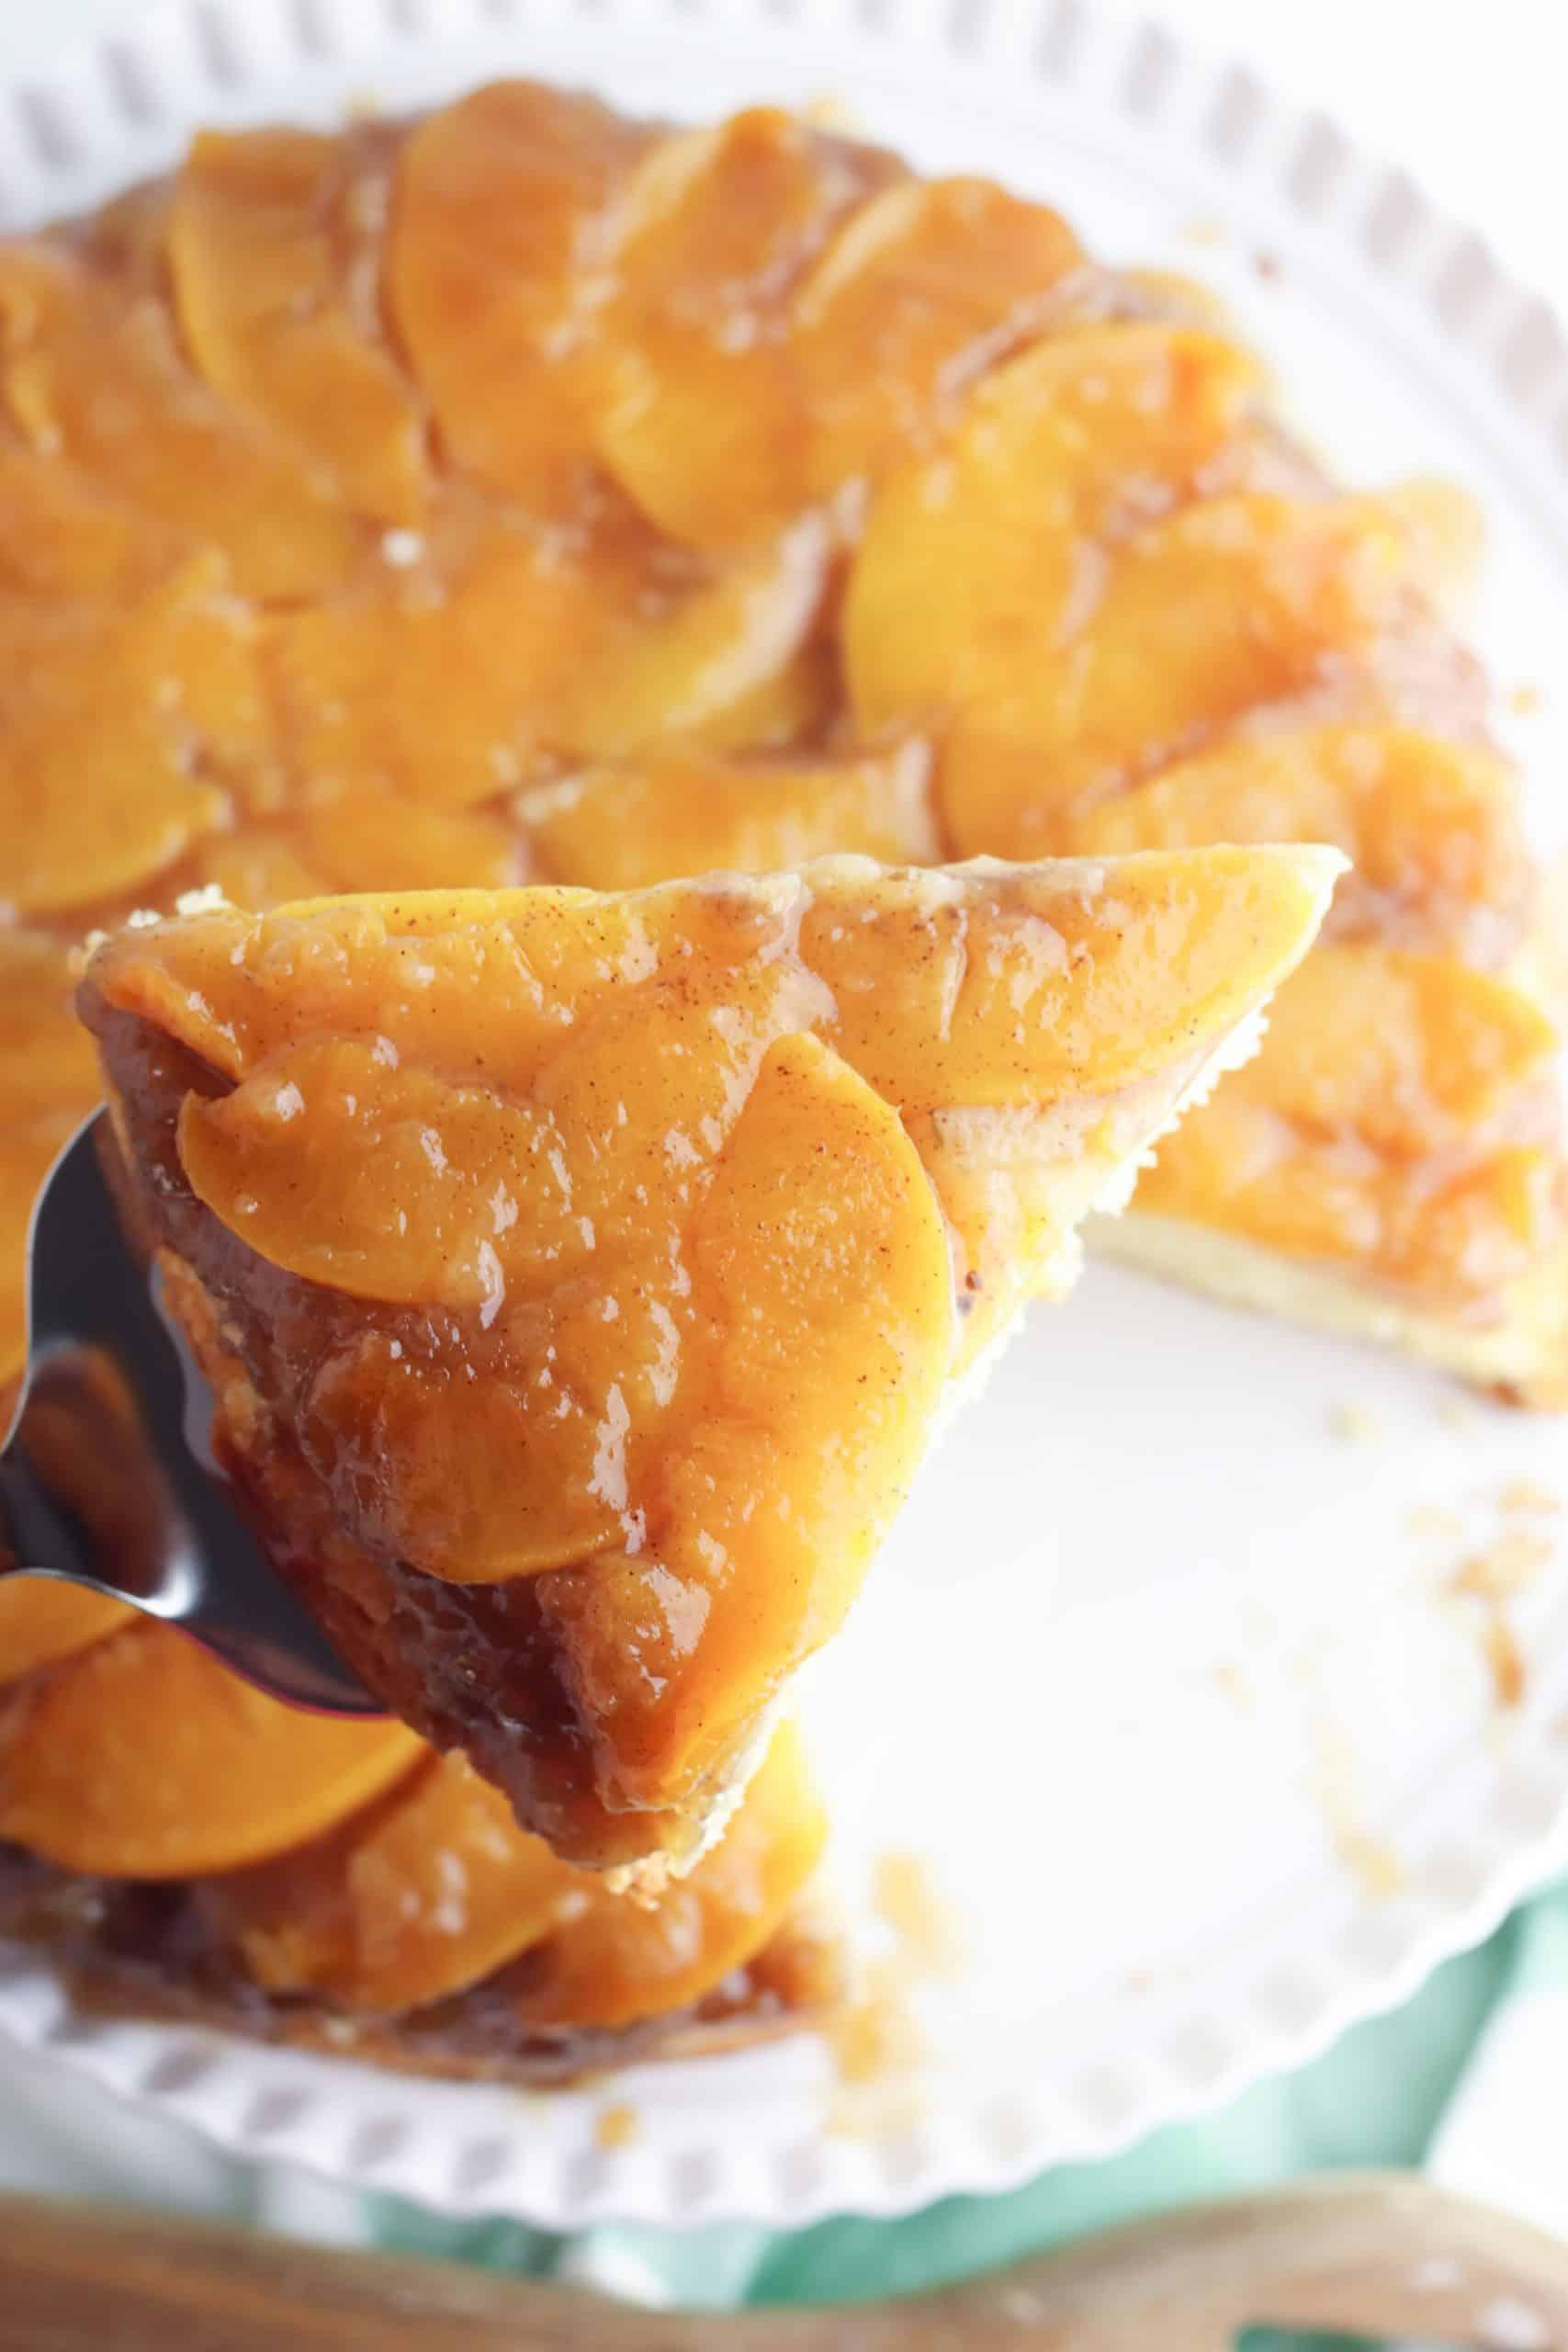 Peach Upside Down Cake Slice